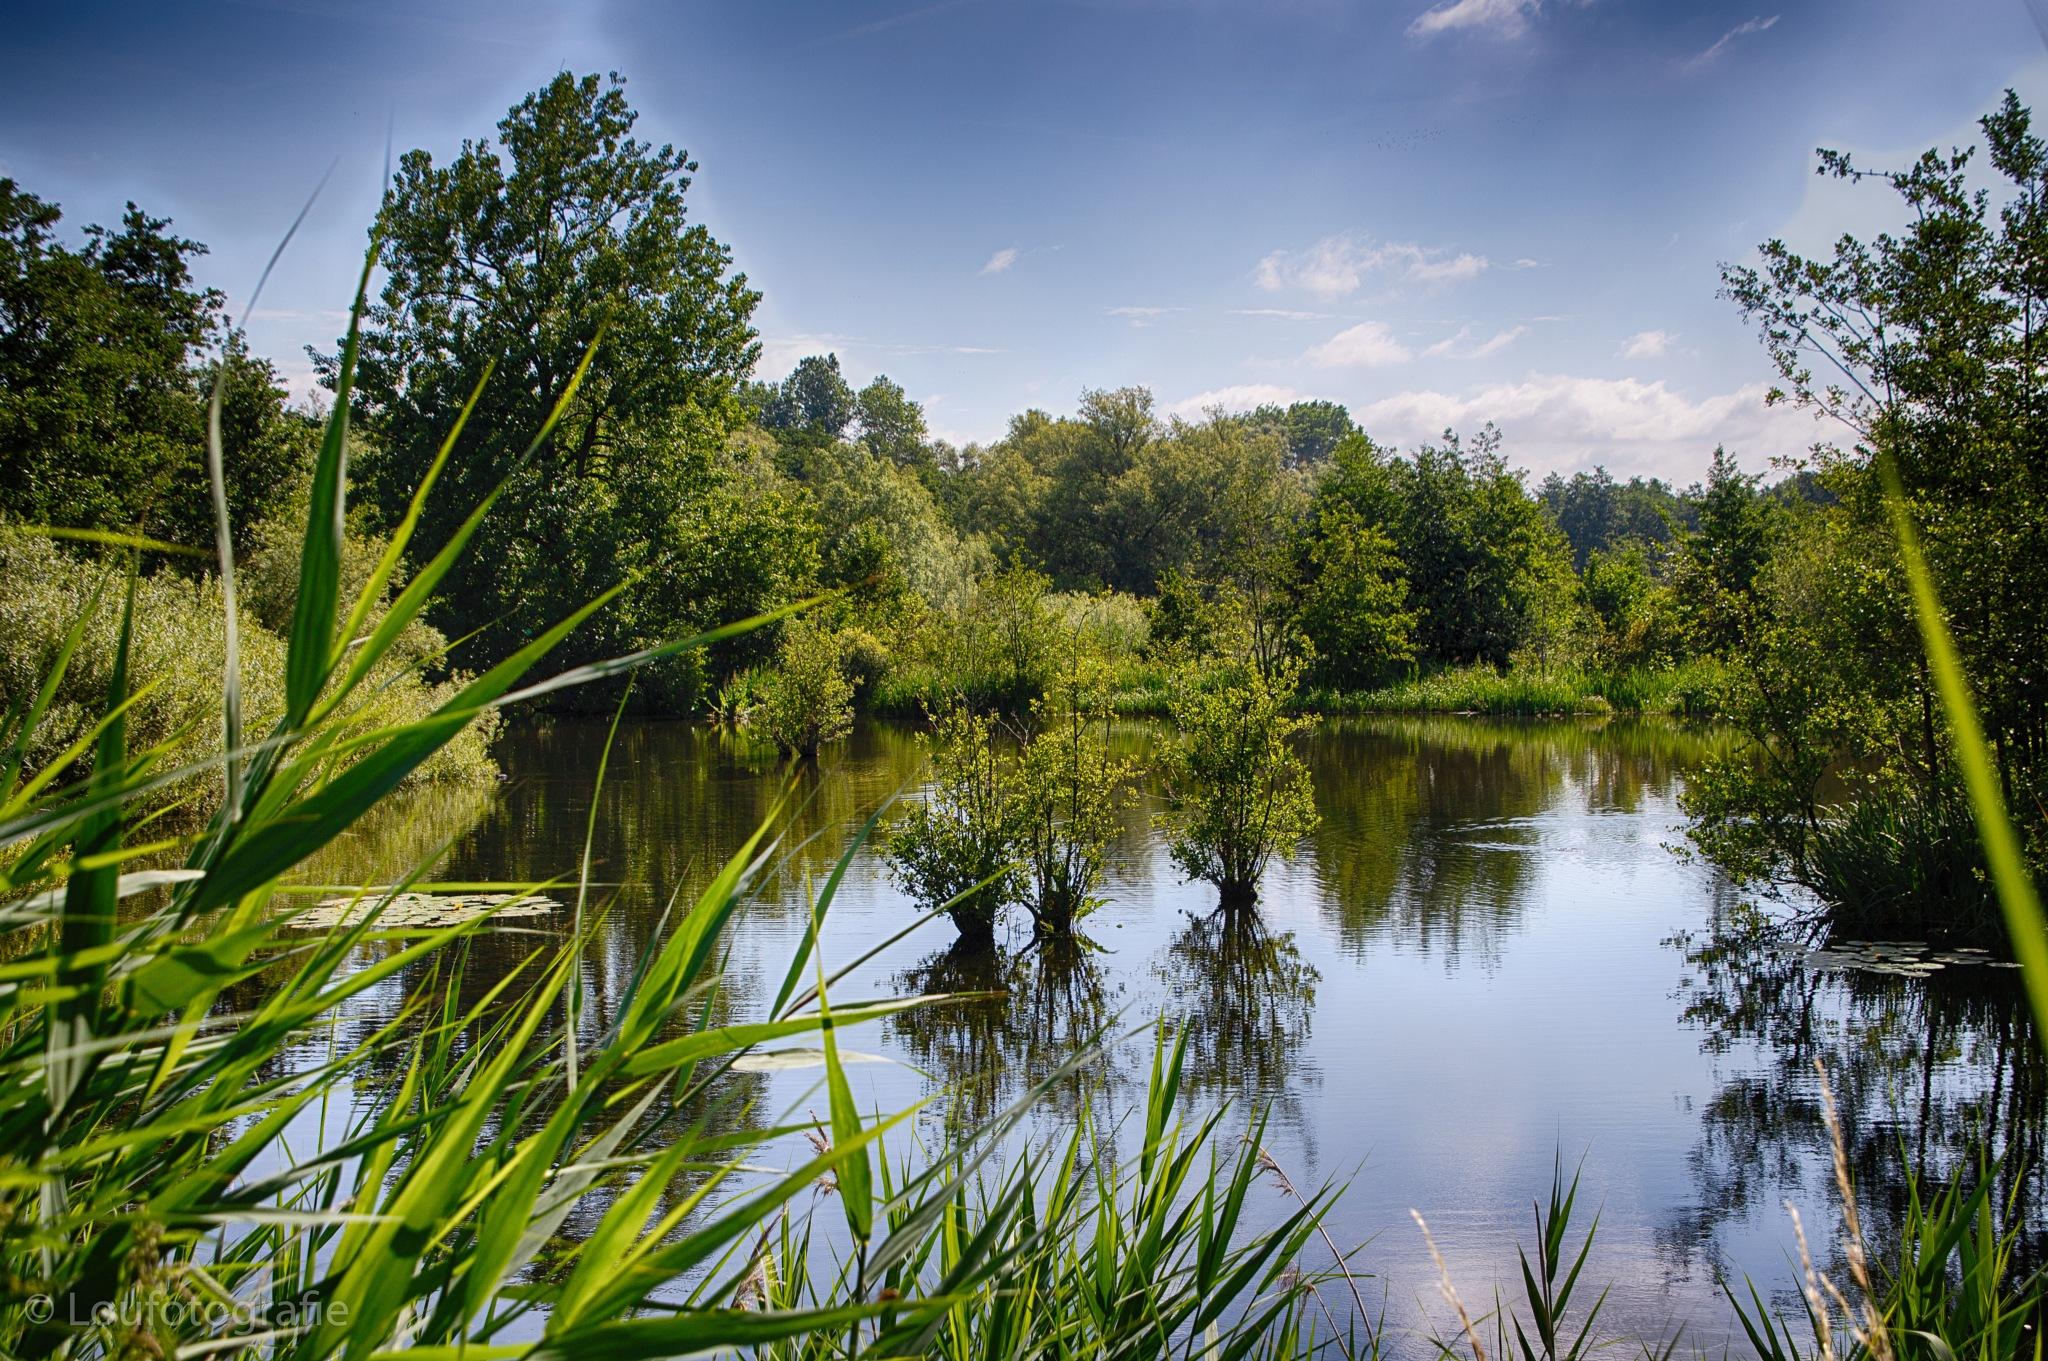 Lokeren natuurgebied by Loufotografie